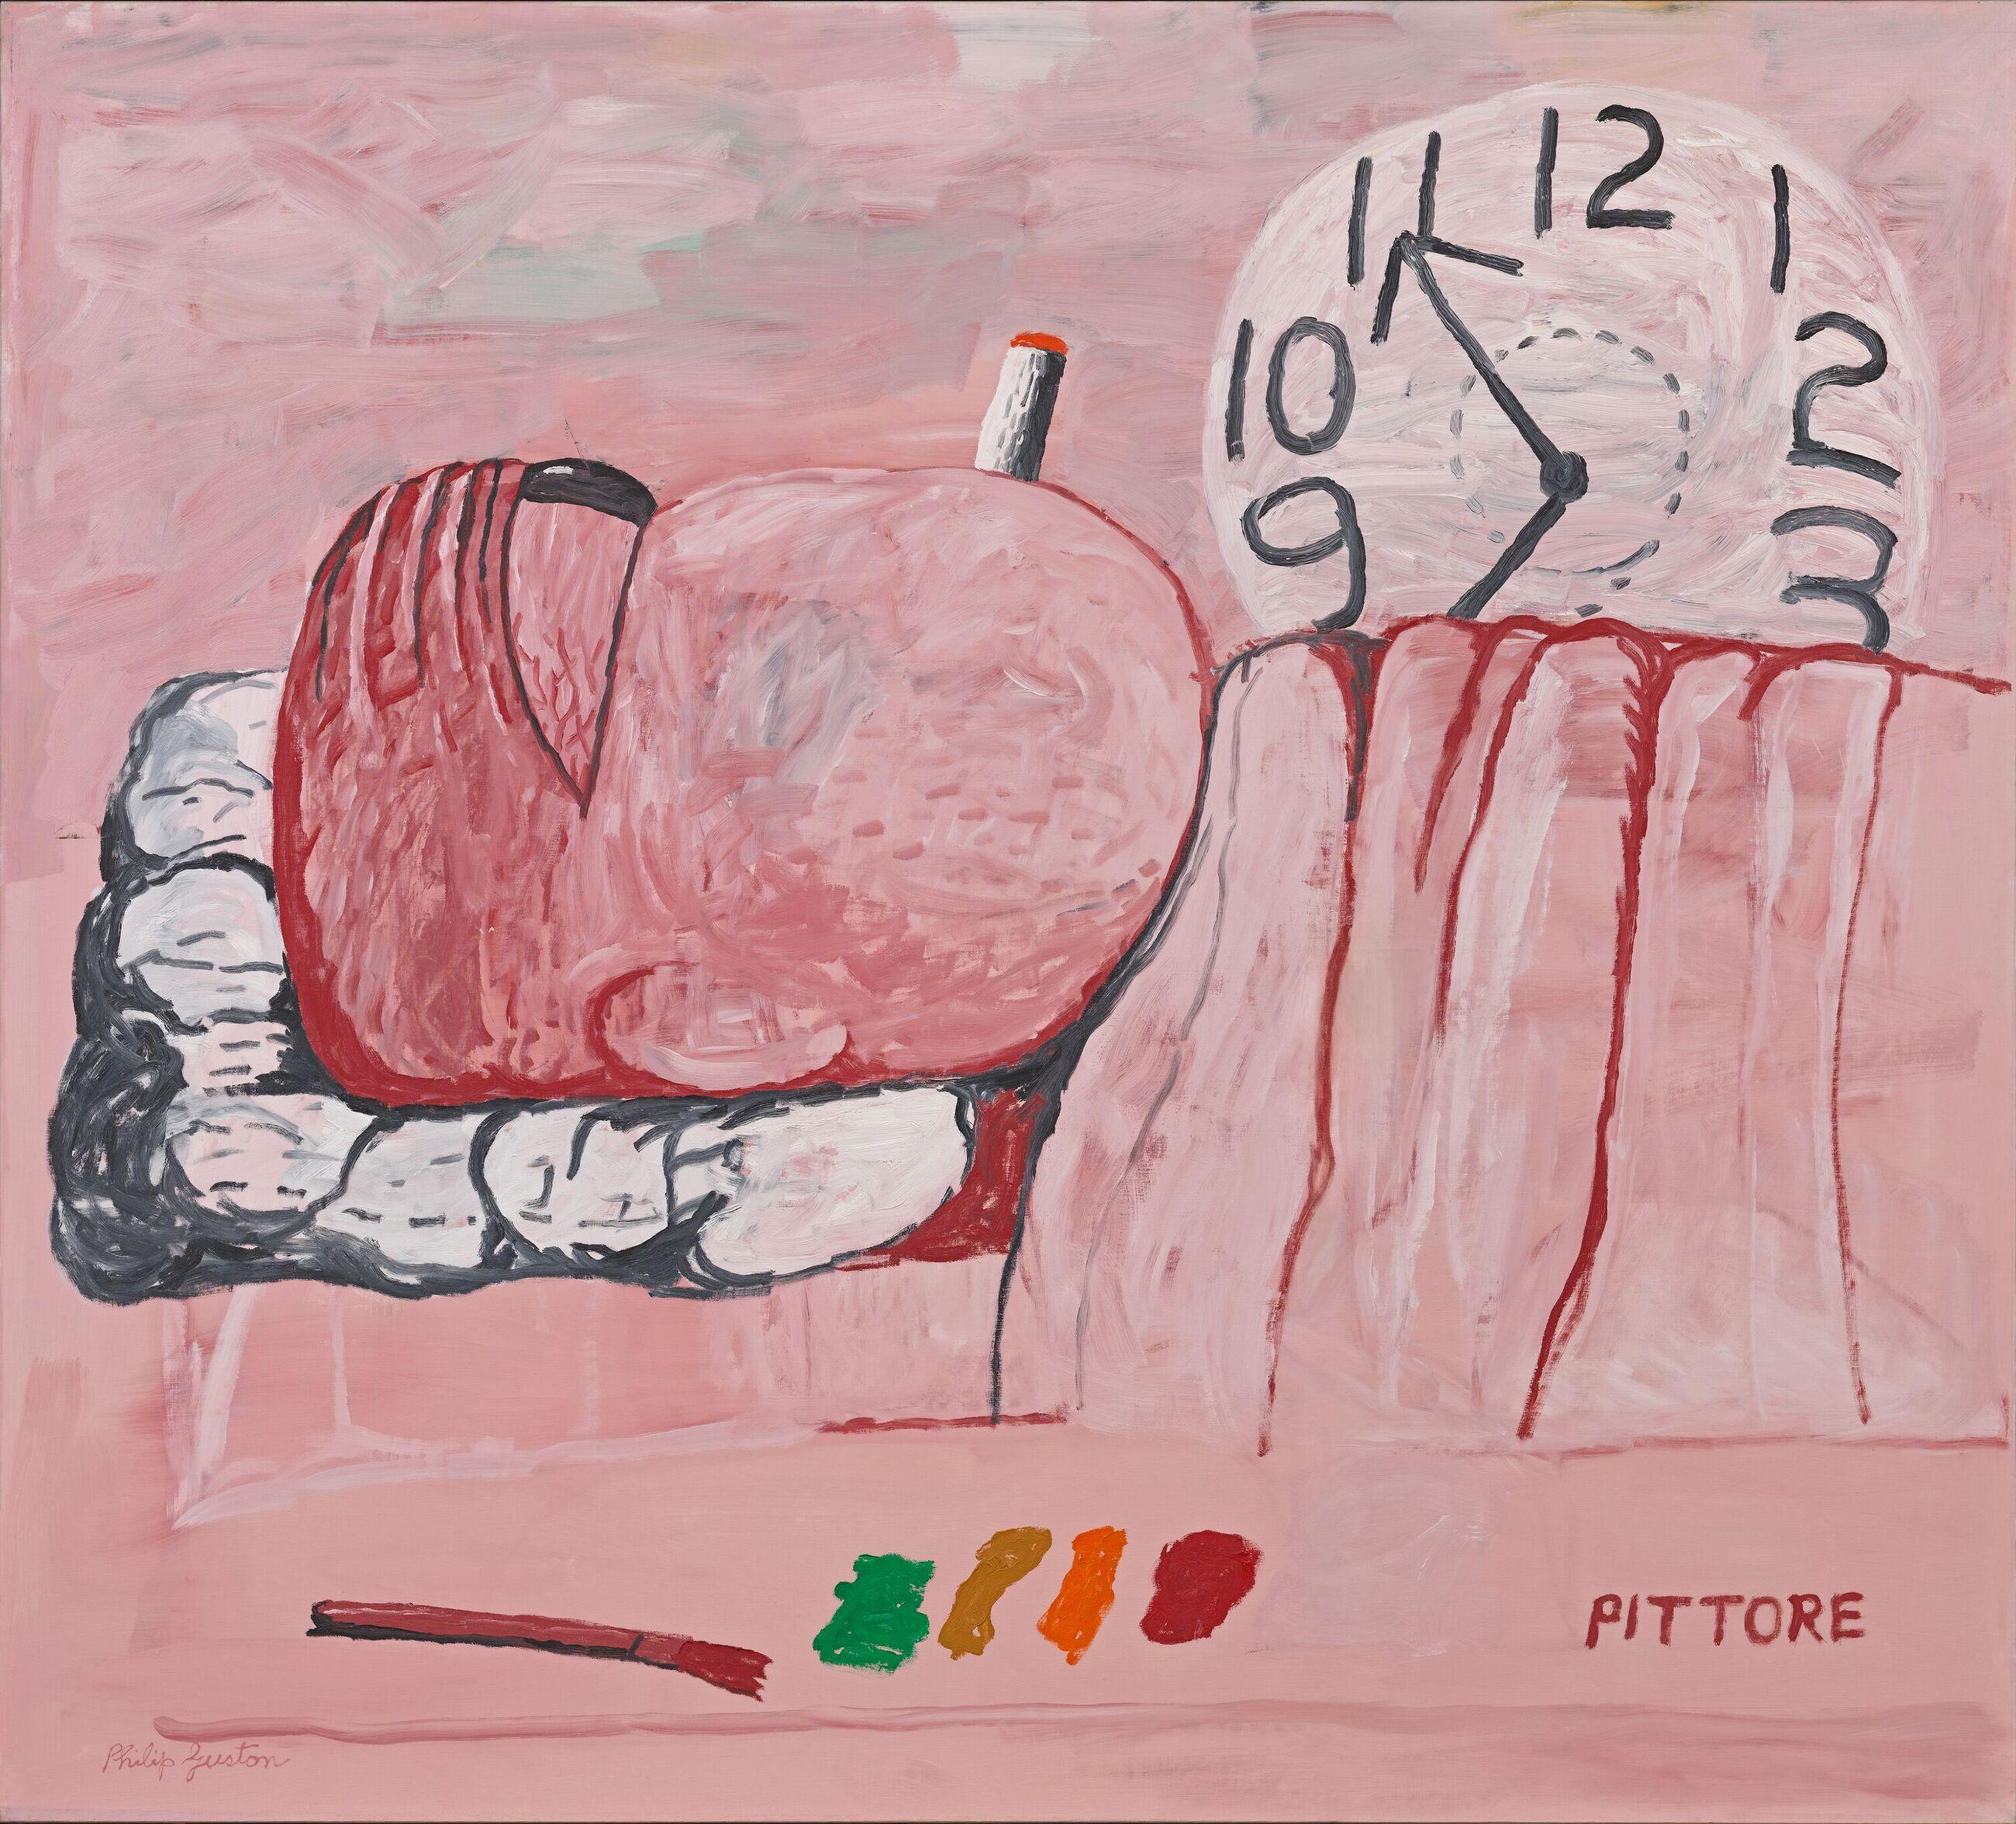 Pittore, 1973 Oil on canvas 184.8 x 204.5 cm / 72 3/4 x 80 1/2 in Private Collection © The Estate of Philip Guston, courtesy Hauser & Wirth Photo: Genevieve Hanson